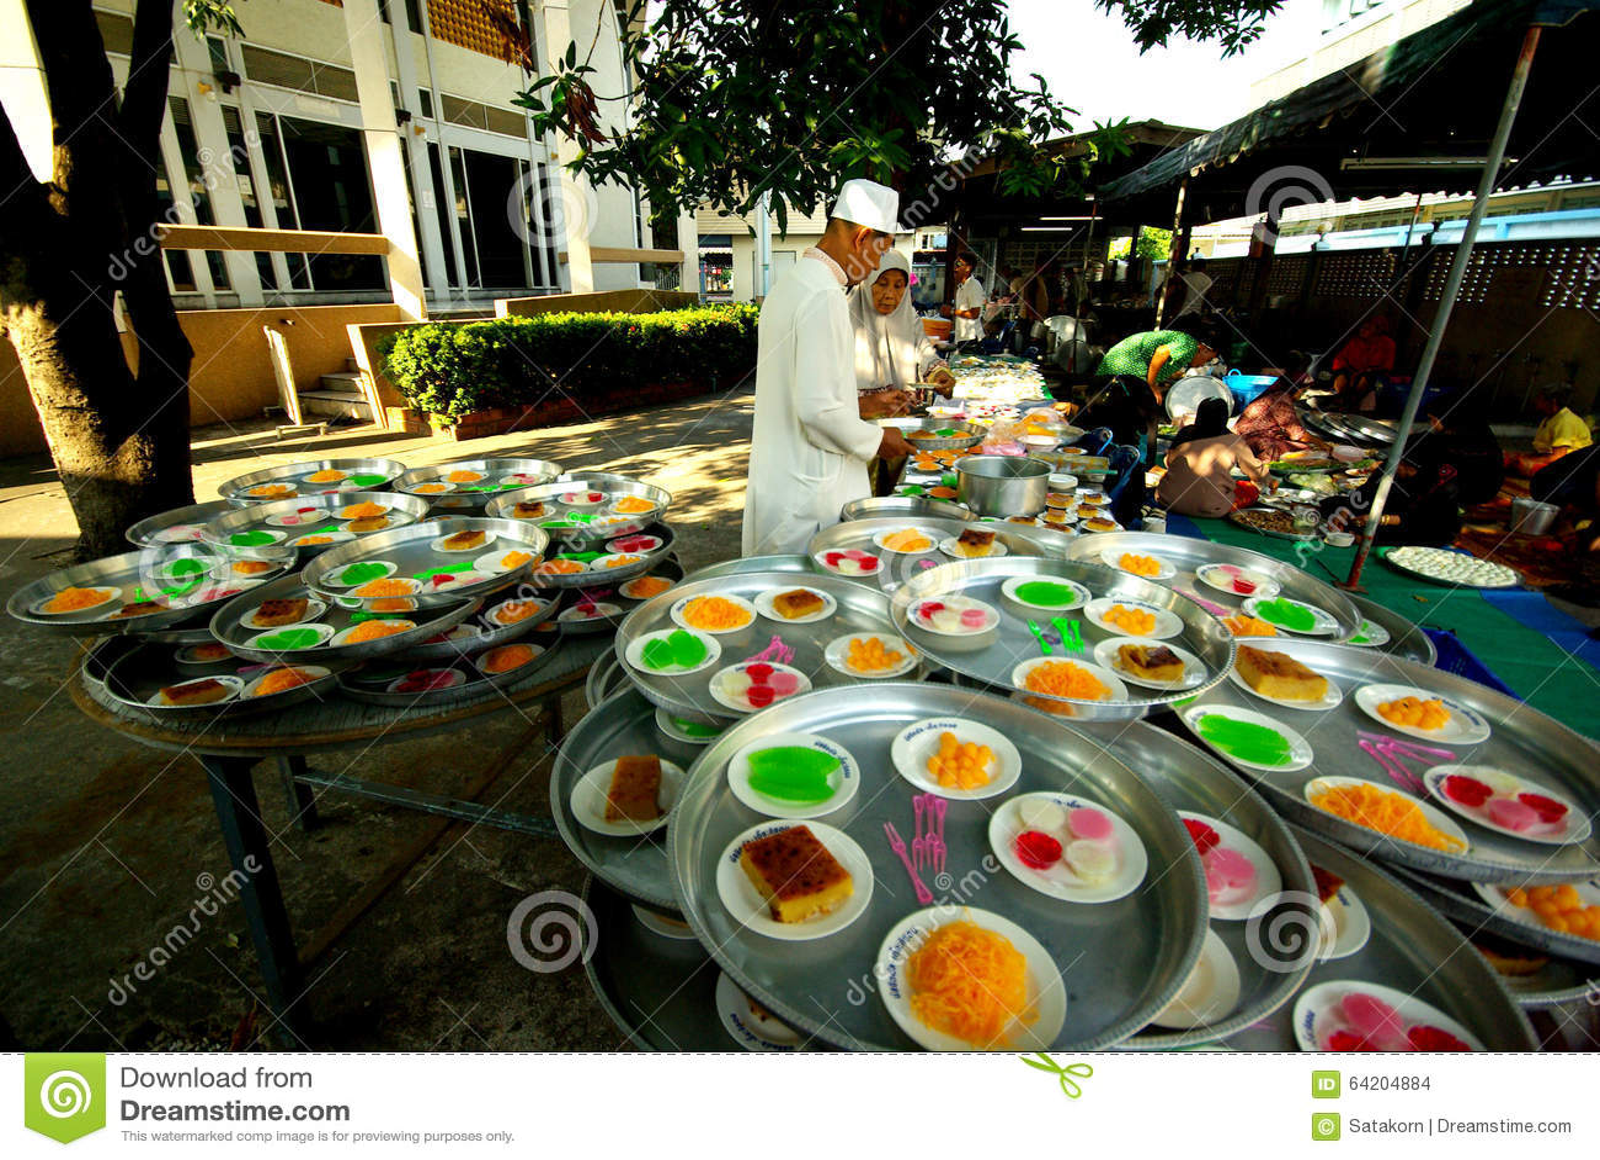 Prepare la comida para la ceremonia de boda